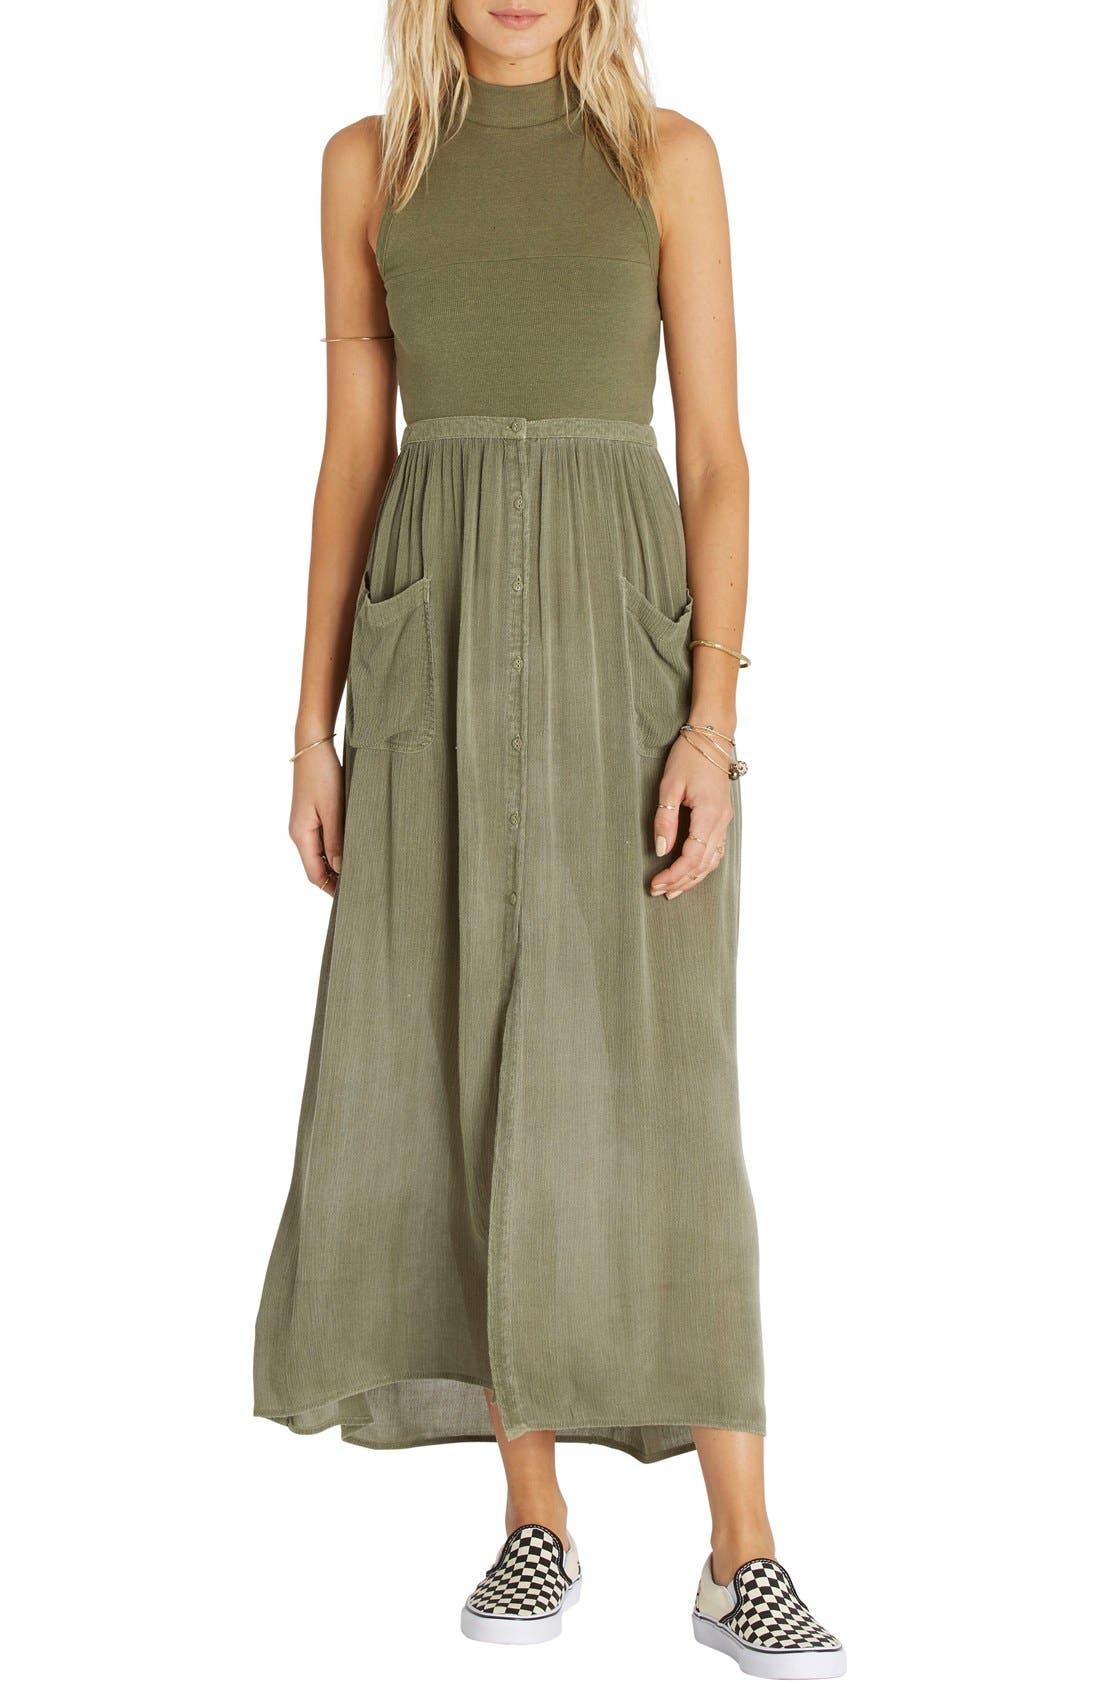 Honey High Waist Maxi Skirt,                         Main,                         color, Seagrass Olive